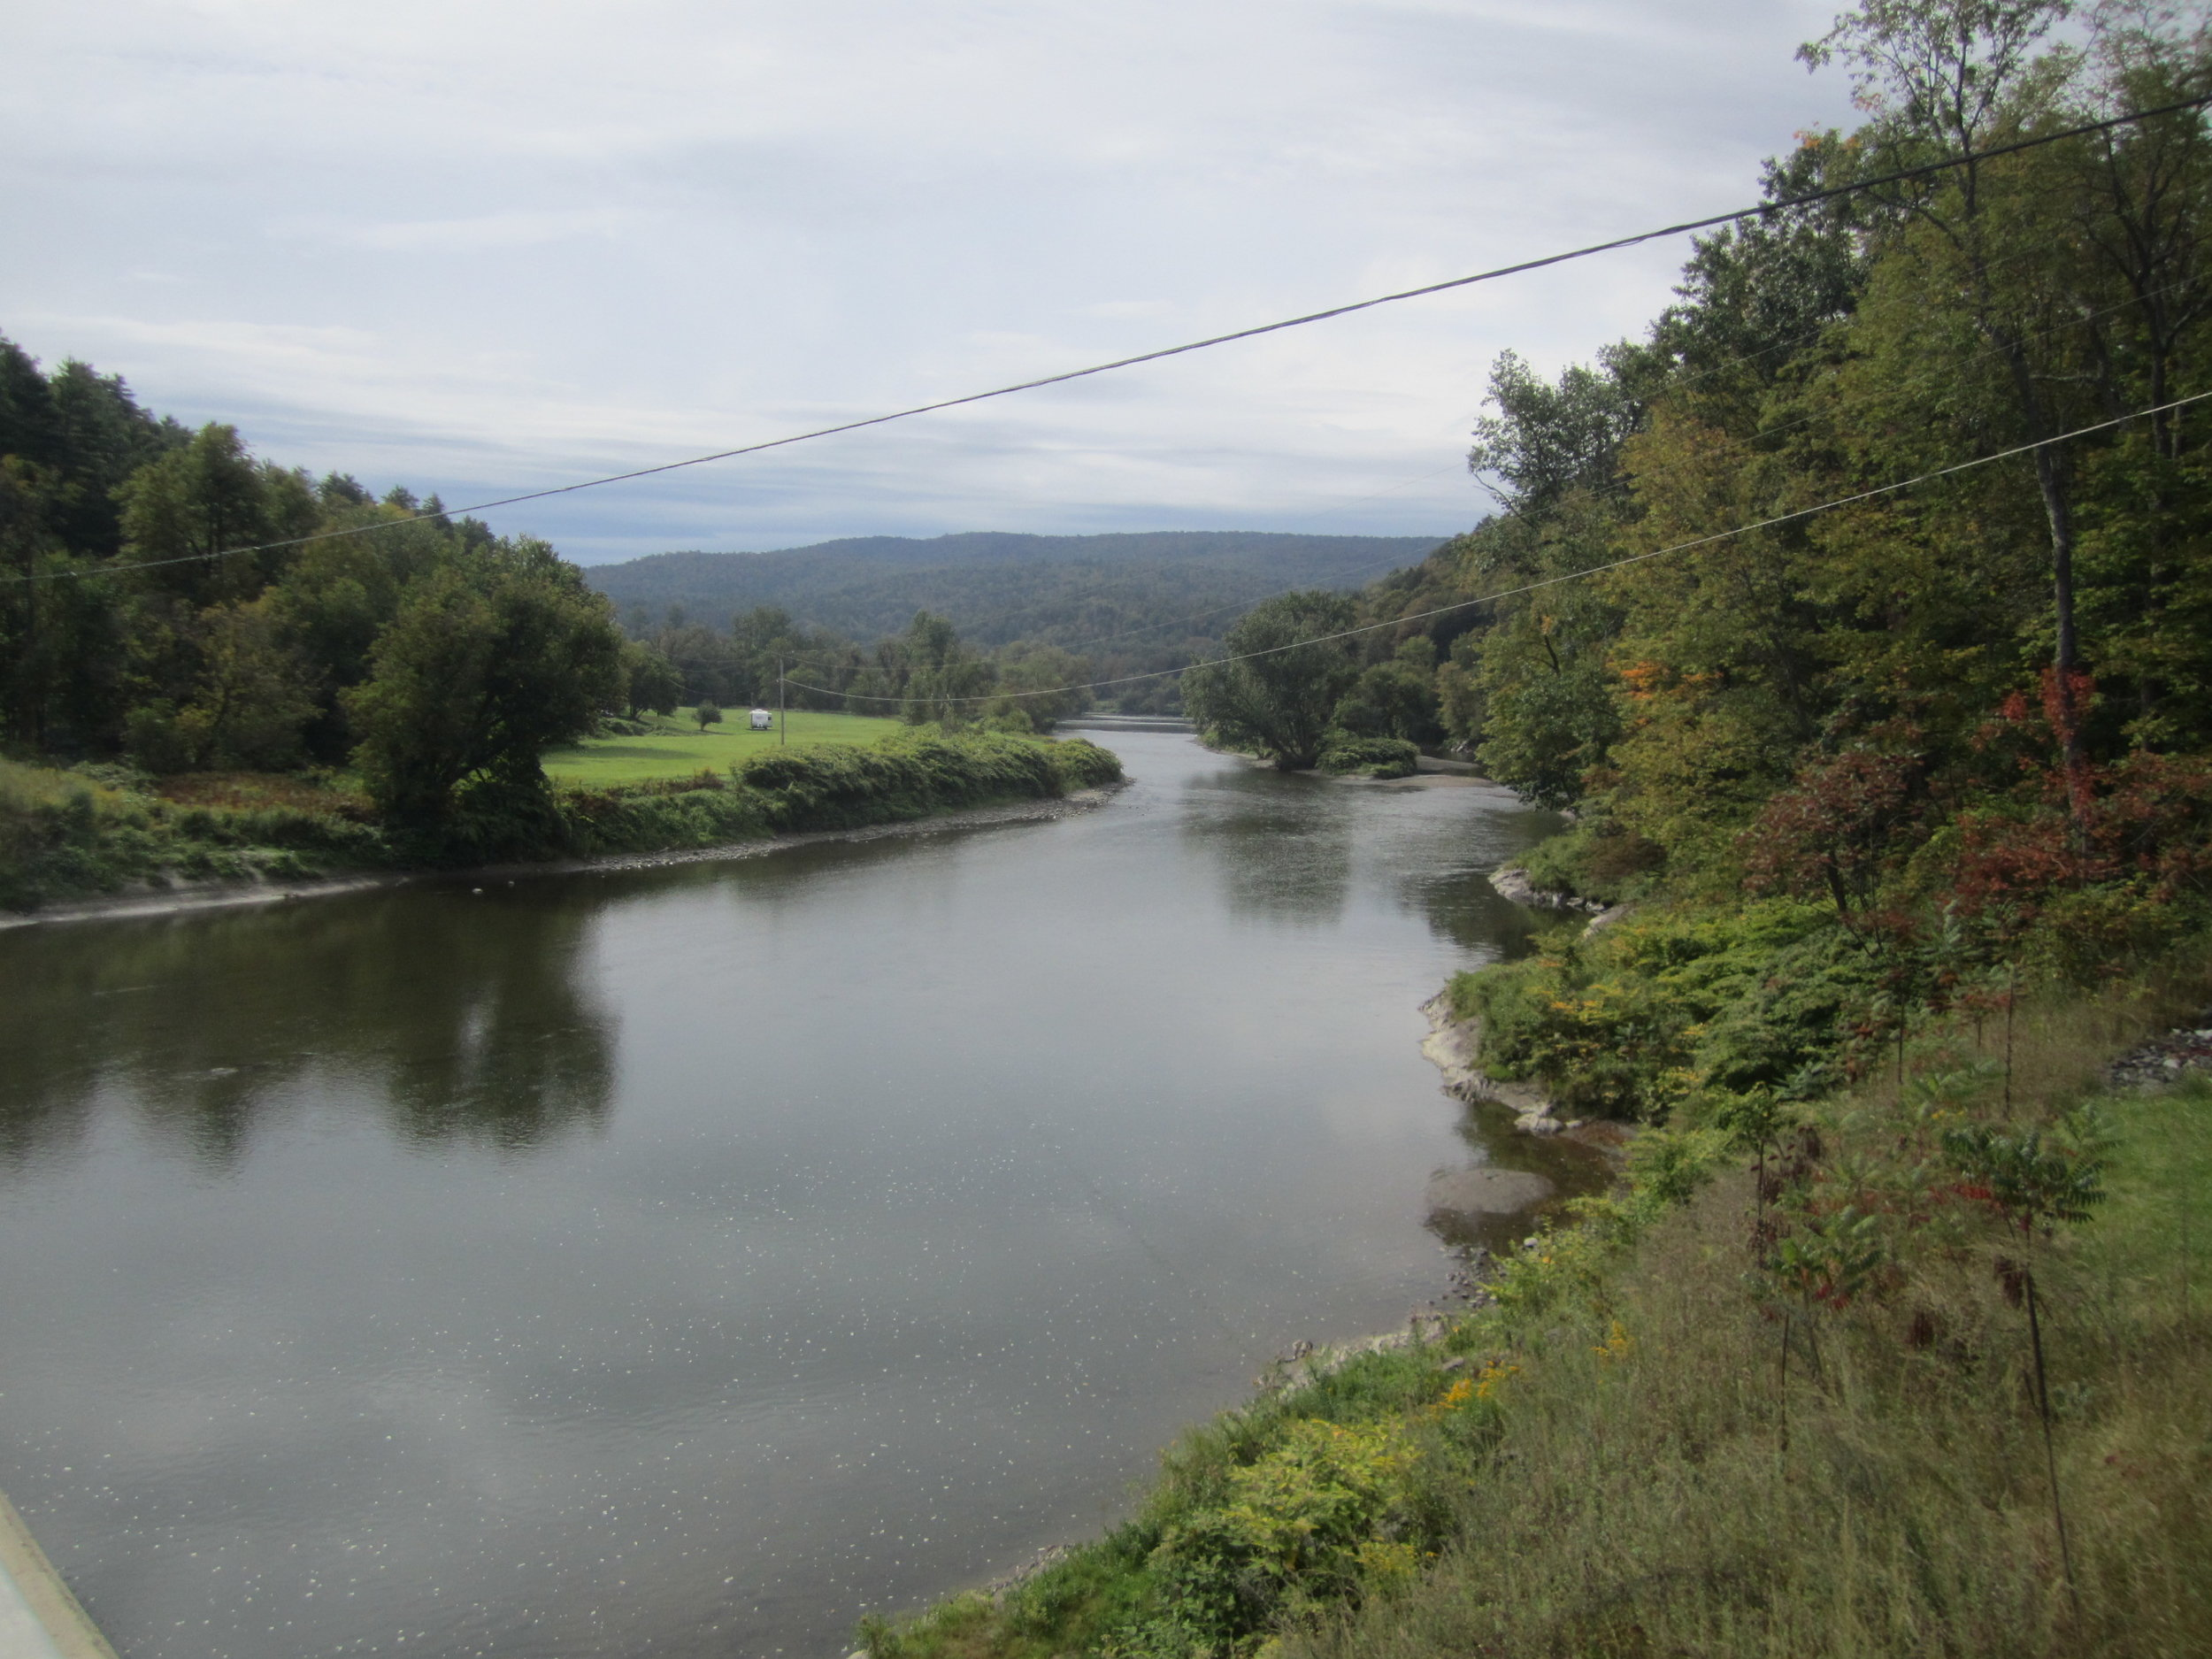 Crossing over the Winooski River